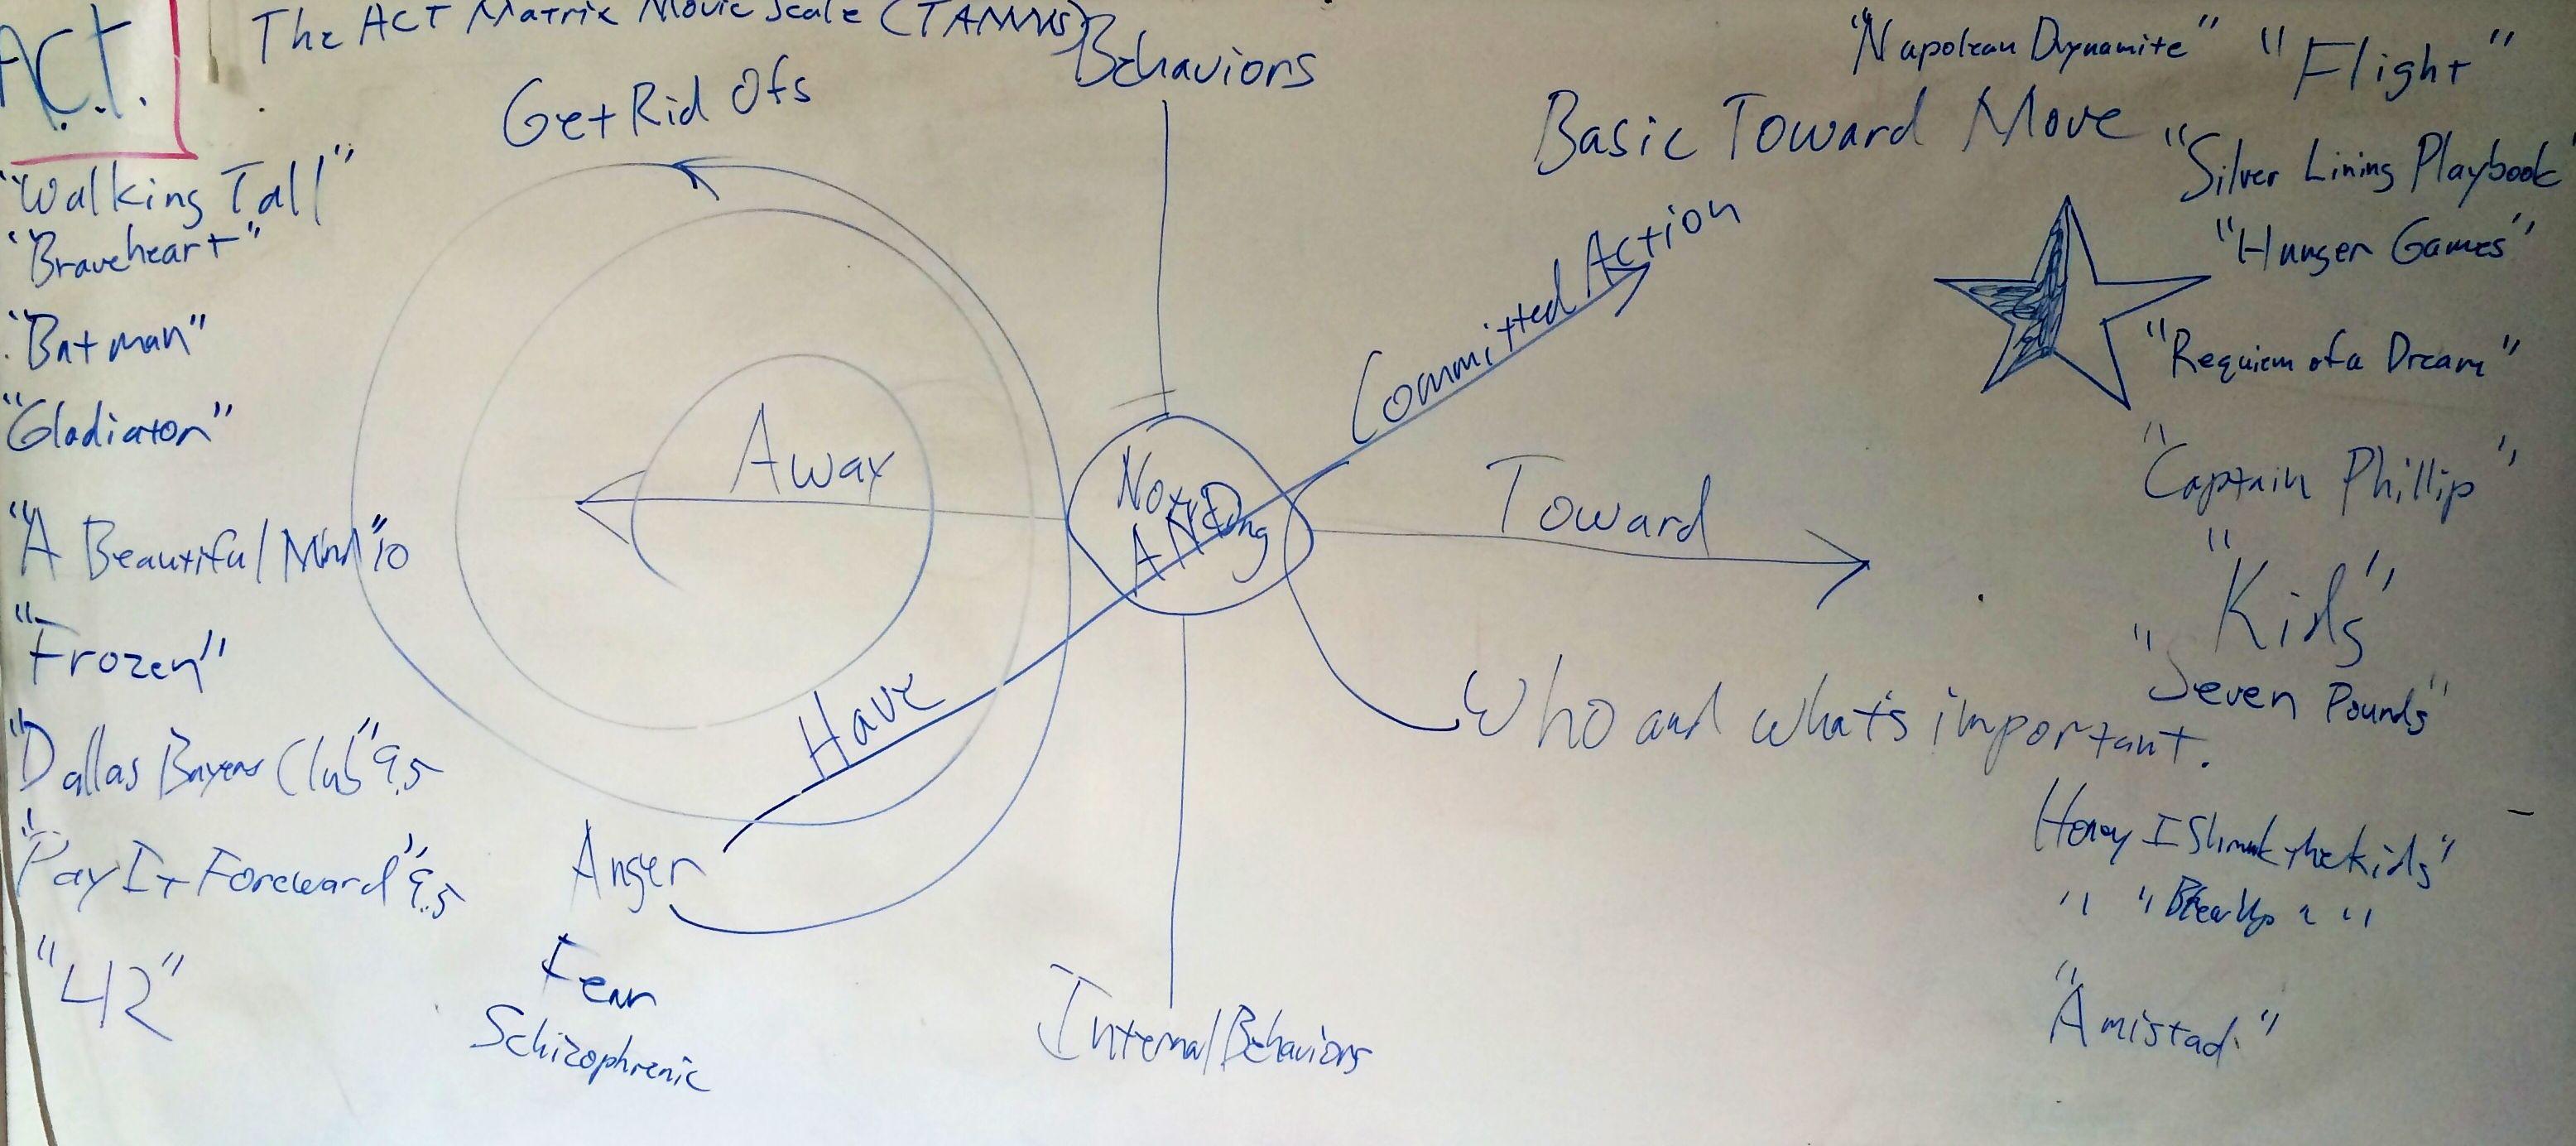 The Act Matrix Movie Scale Tamms Concept Board